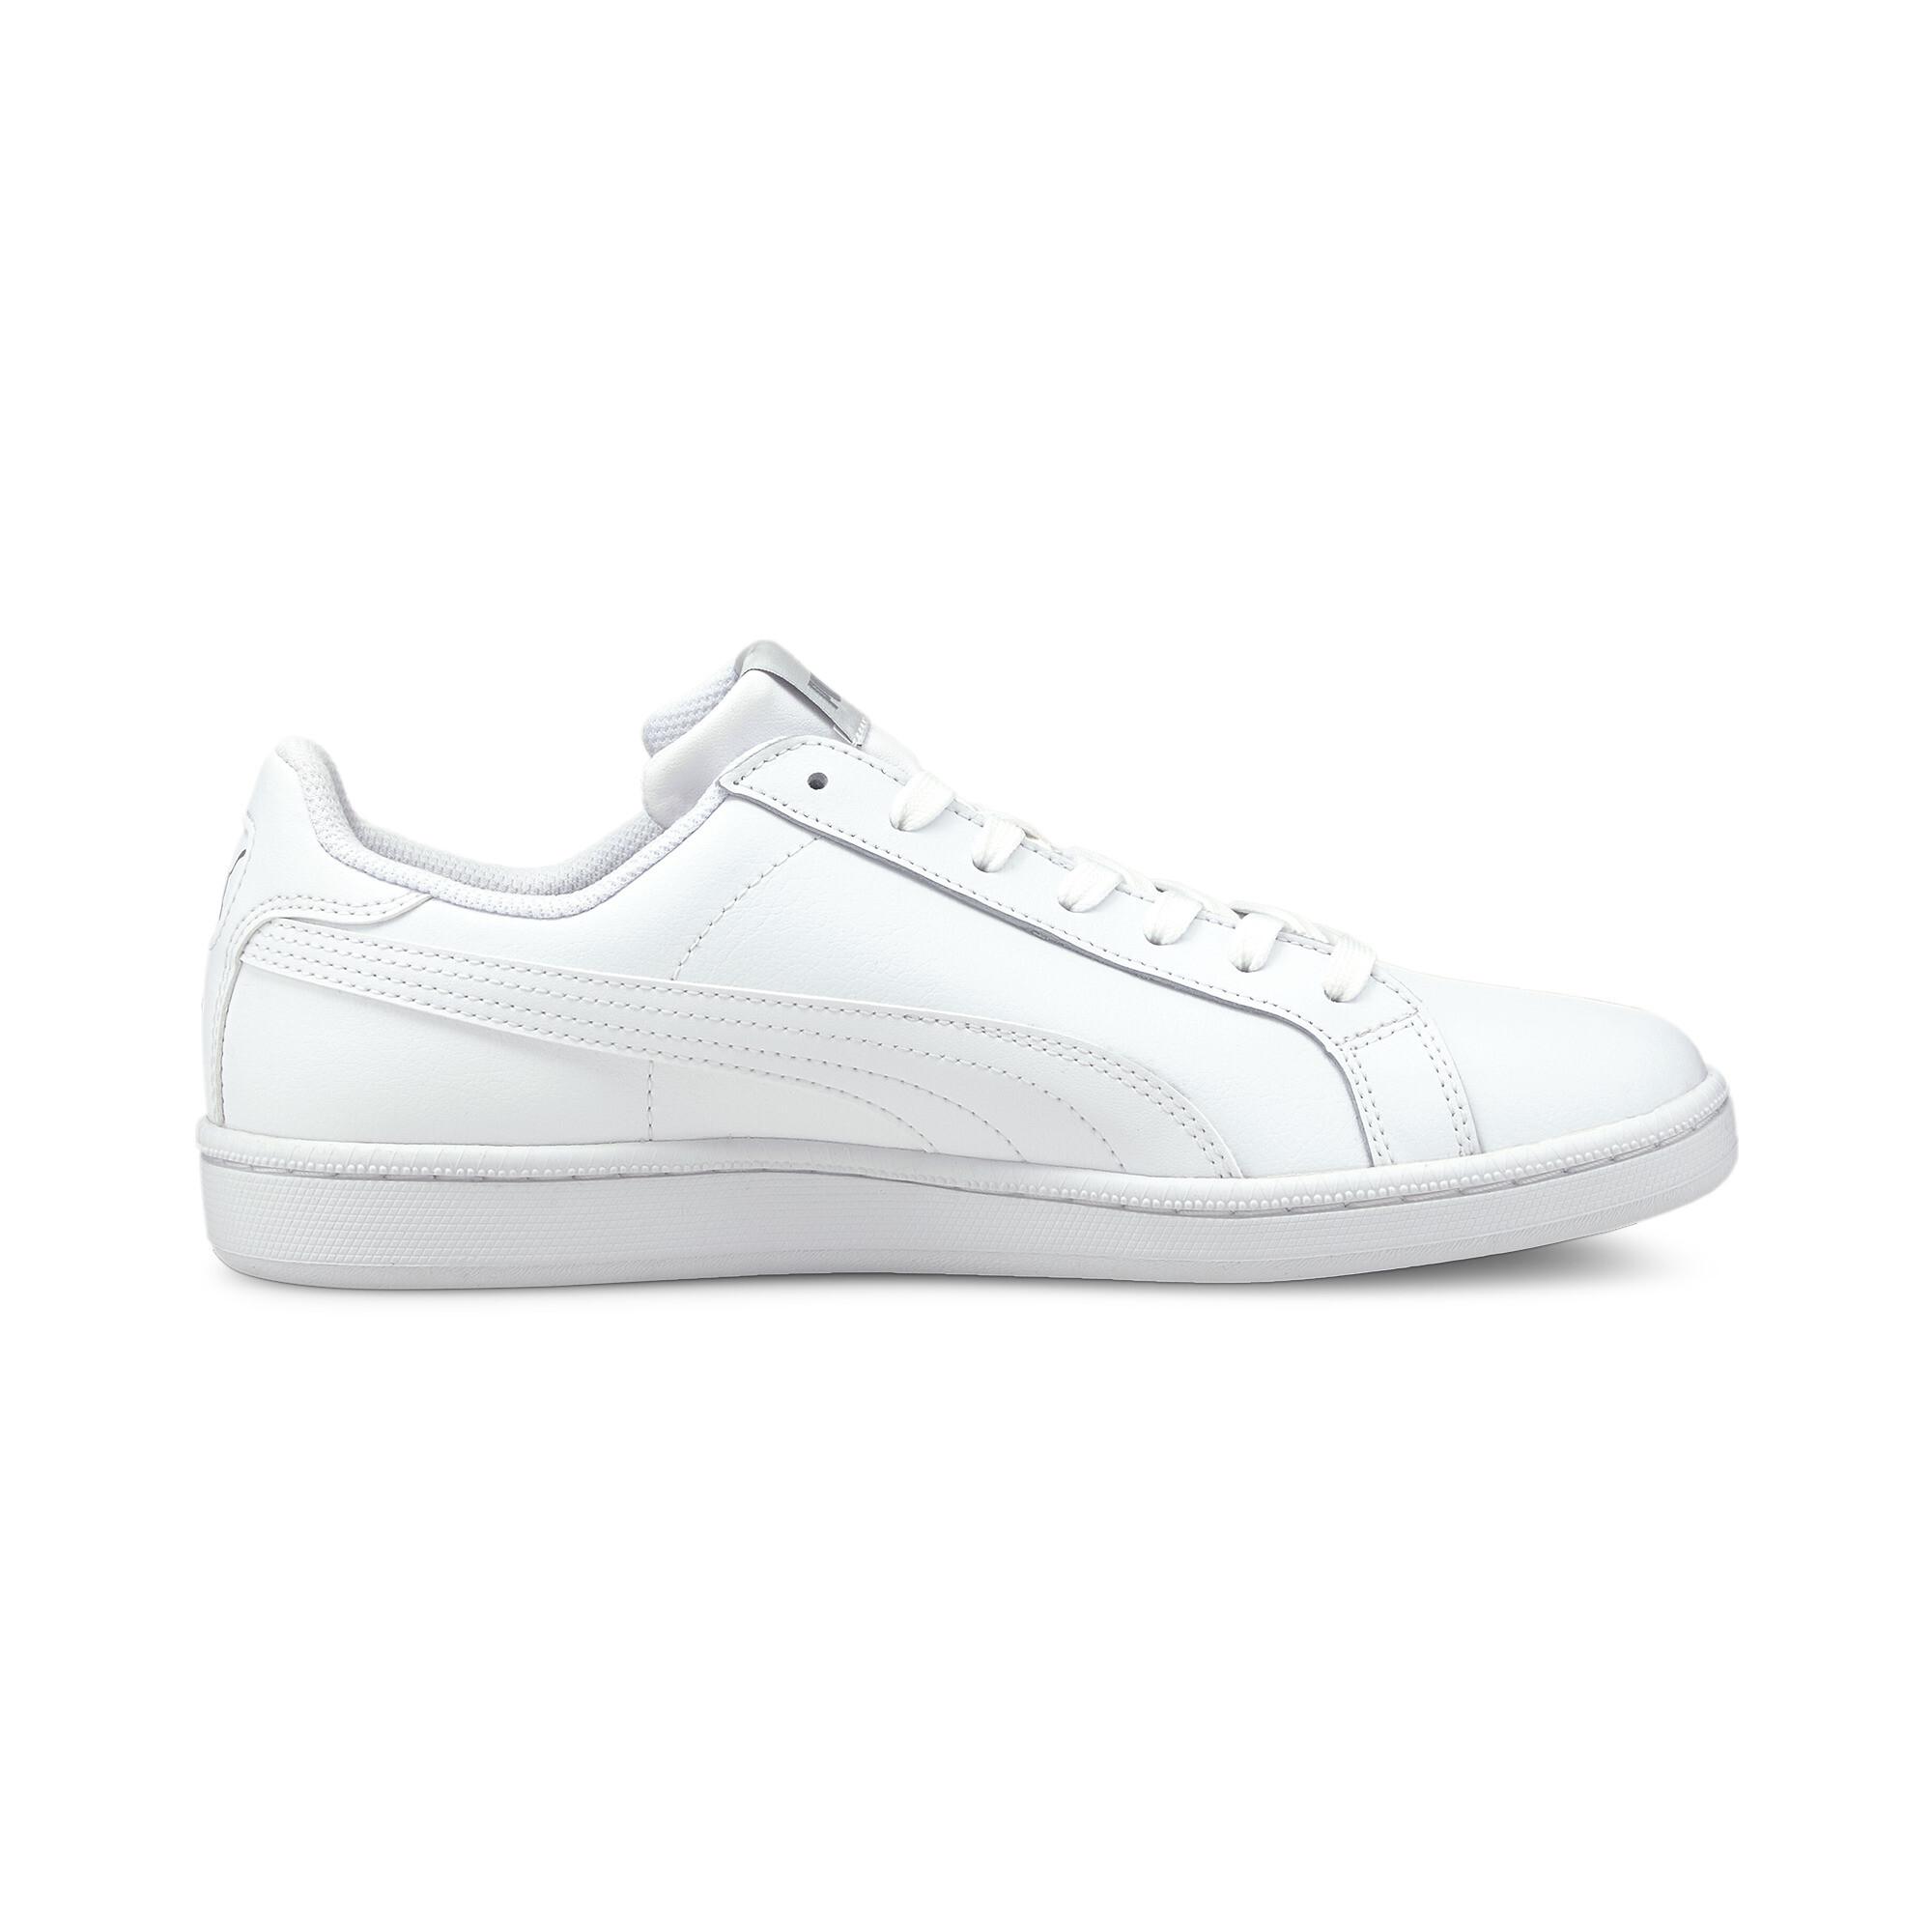 Indexbild 16 - PUMA Smash Trainers Schuhe Sneakers Sport Classics Unisex Neu